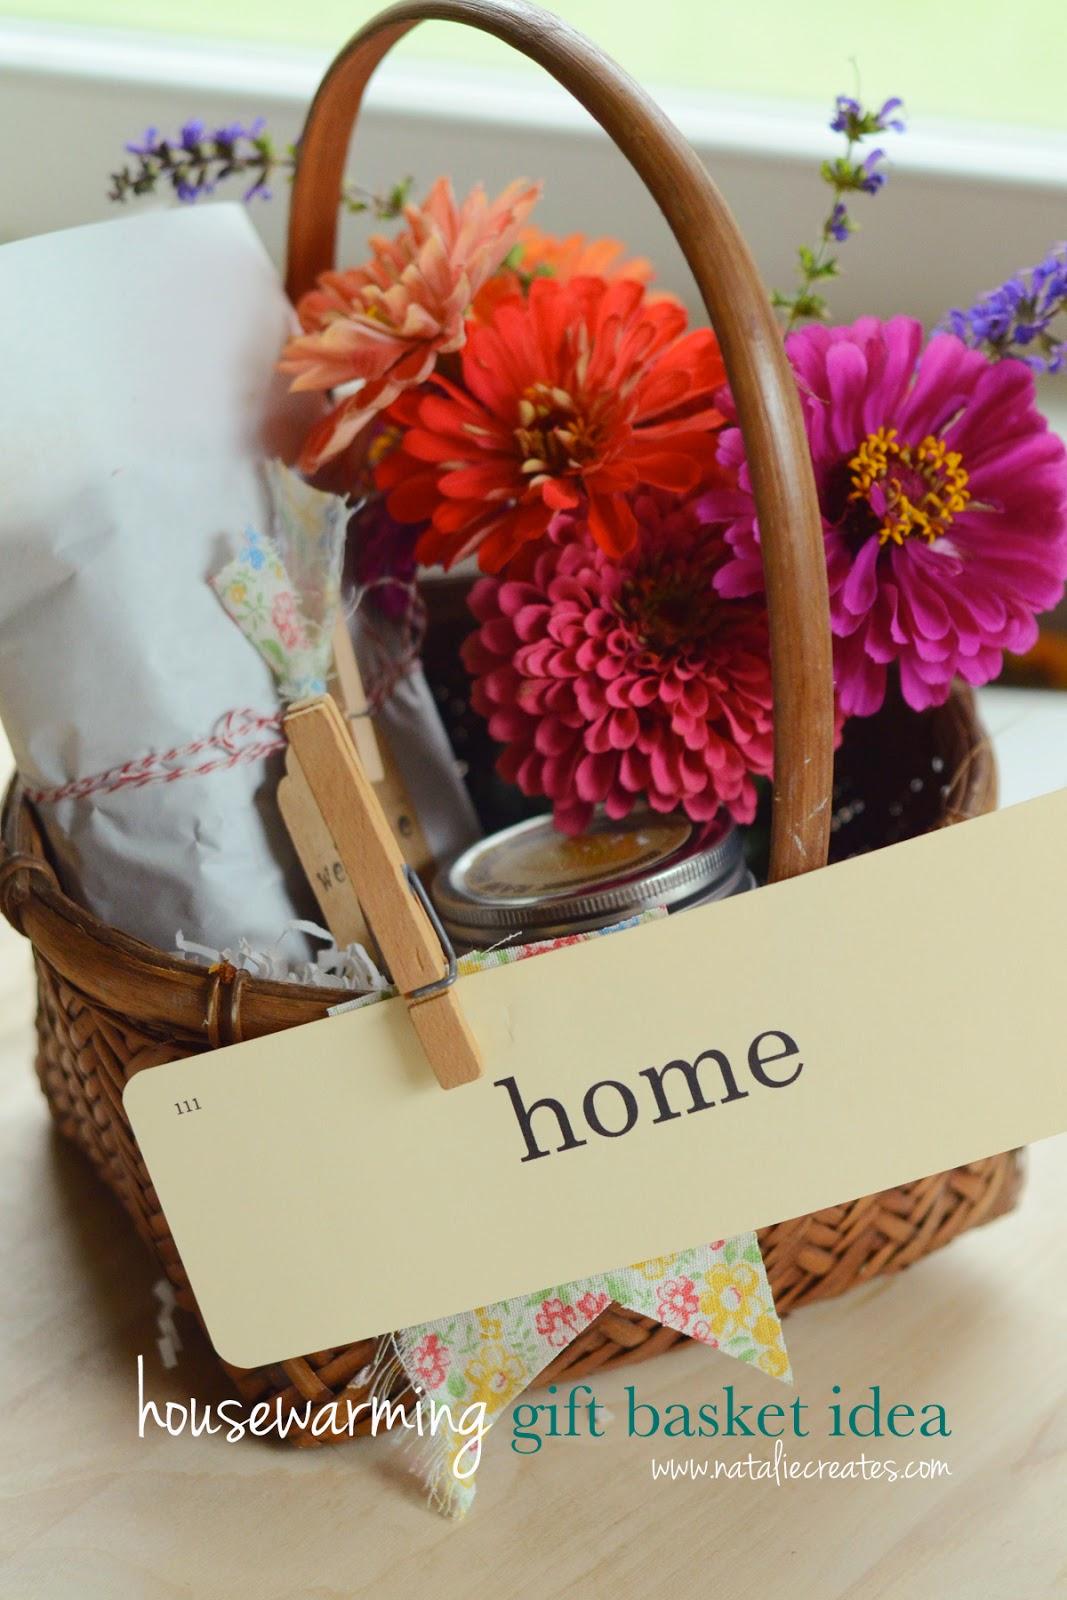 natalie creates: housewarming gift basket idea for under $10